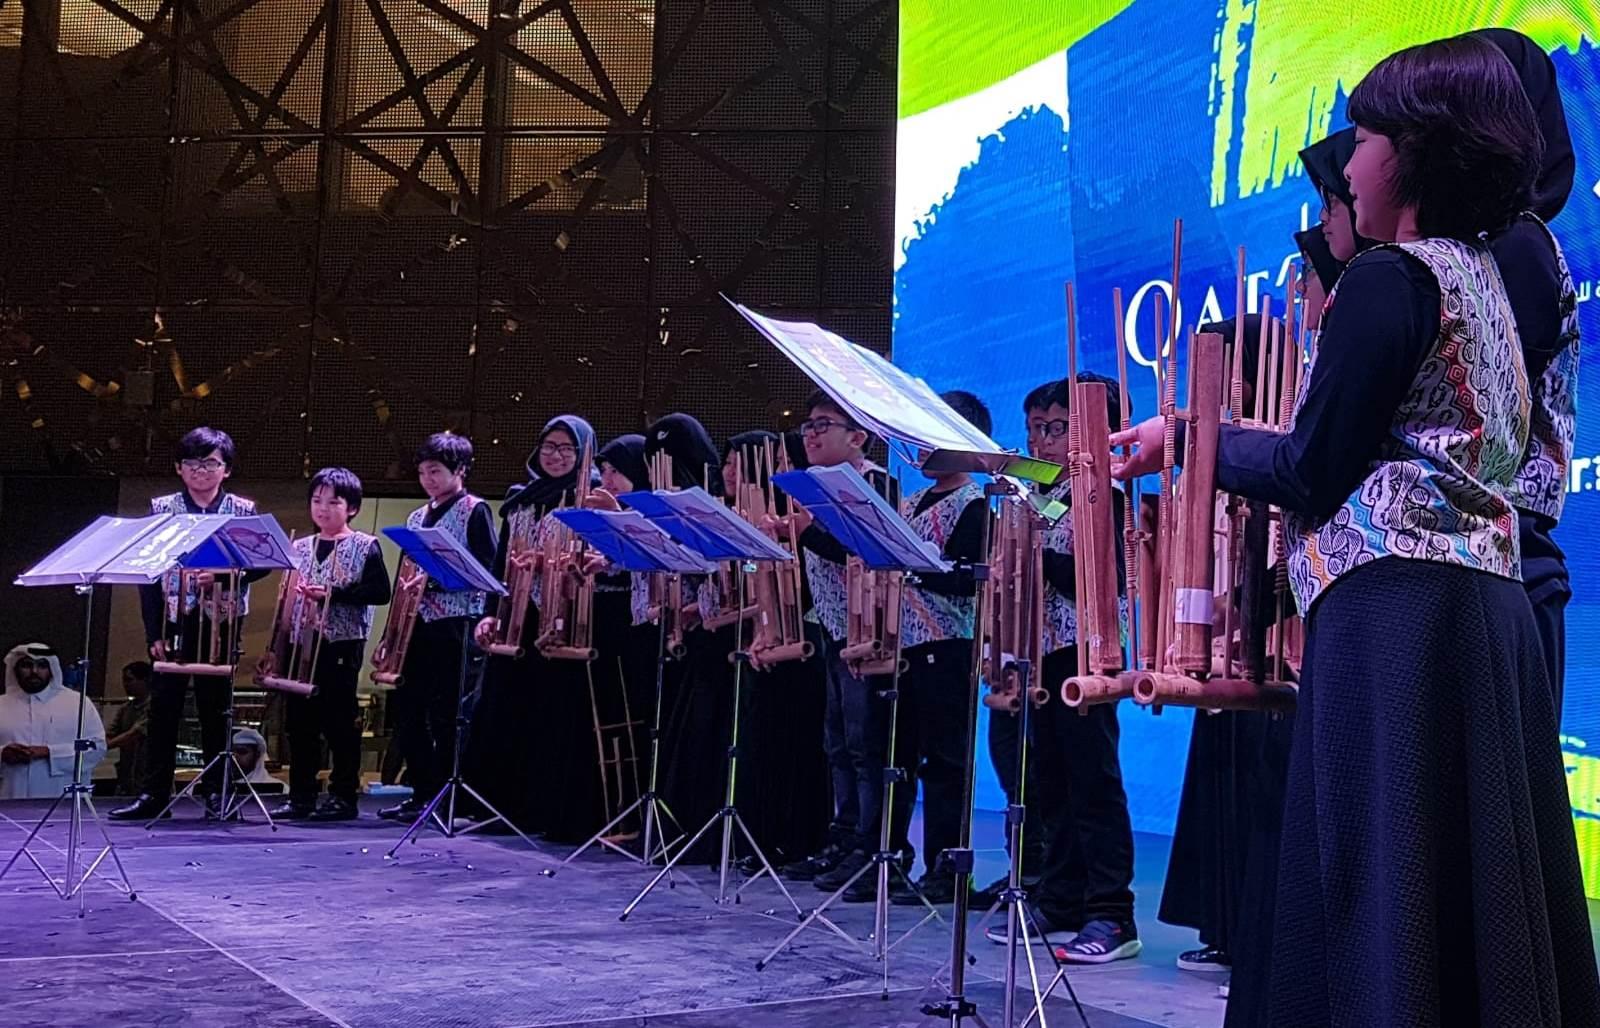 Alunan Musik Angklung Hadir di Festival Musim Panas Qatar